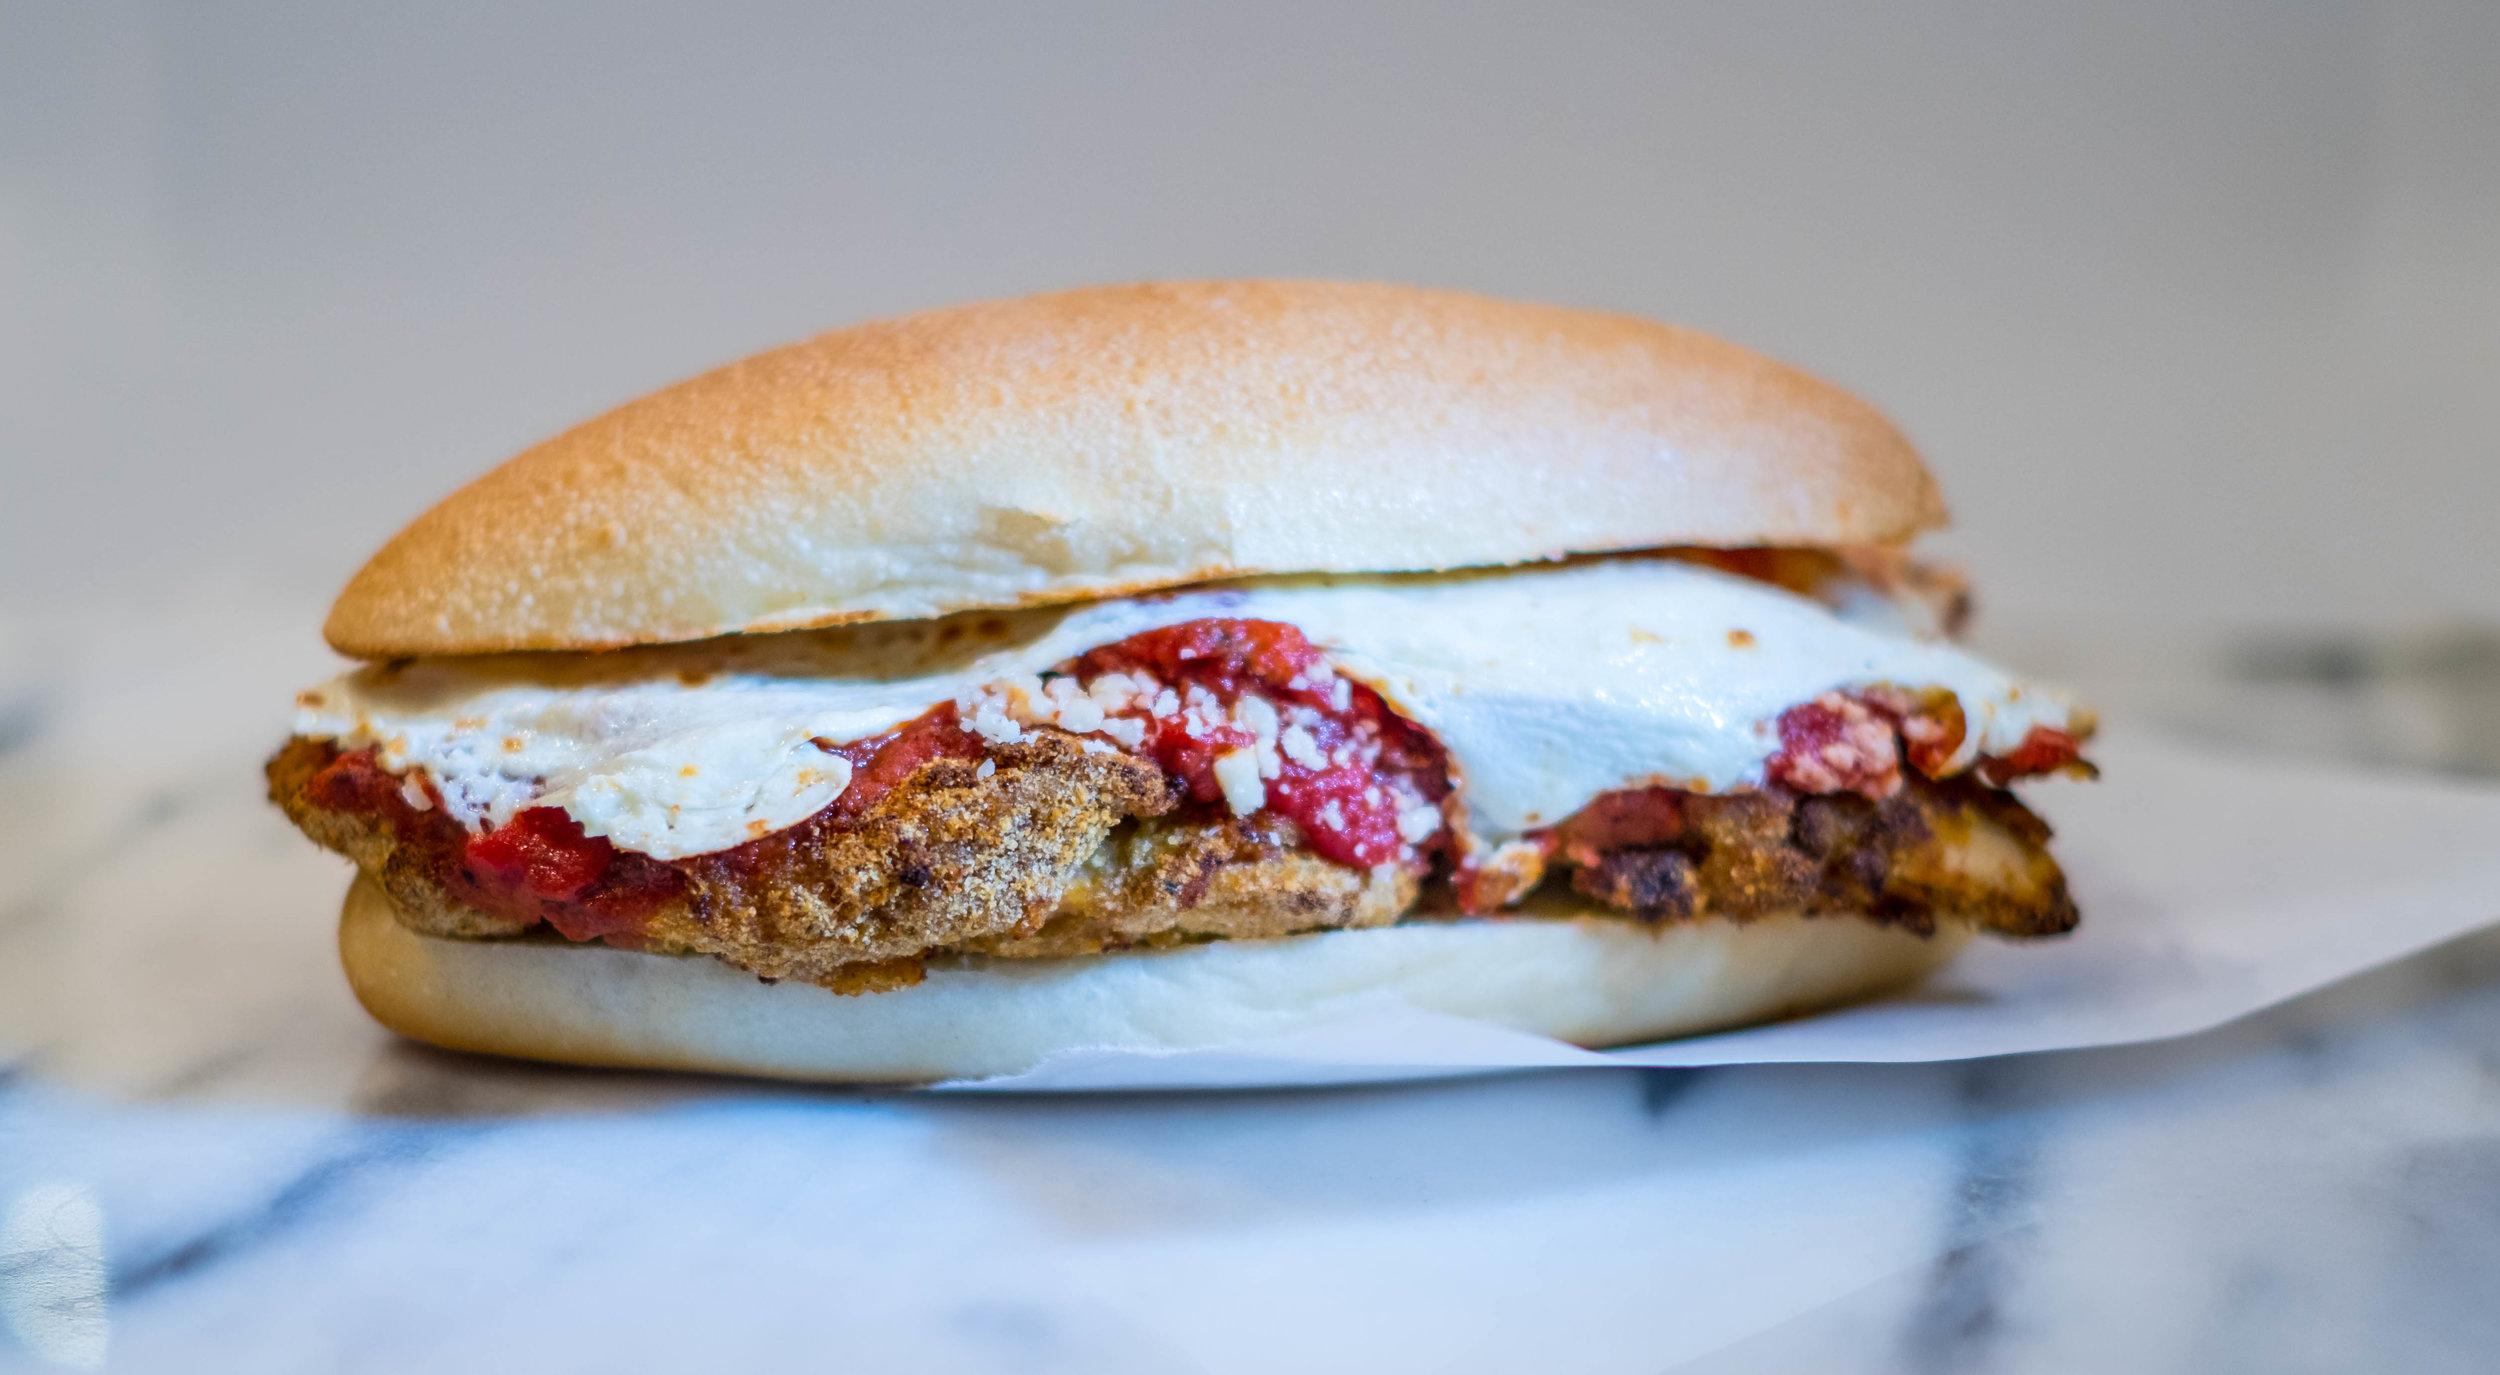 Chicken + Parm - PARMIGIANO-HERB CRUSTED CHICKEN, CALABRIAN TOMATO SAUCE, OAXACAN CHEESE, VALSERENA SOLO DI BRUNA PARMIGIANO REGGIANO, SUB ROLL - $10.95